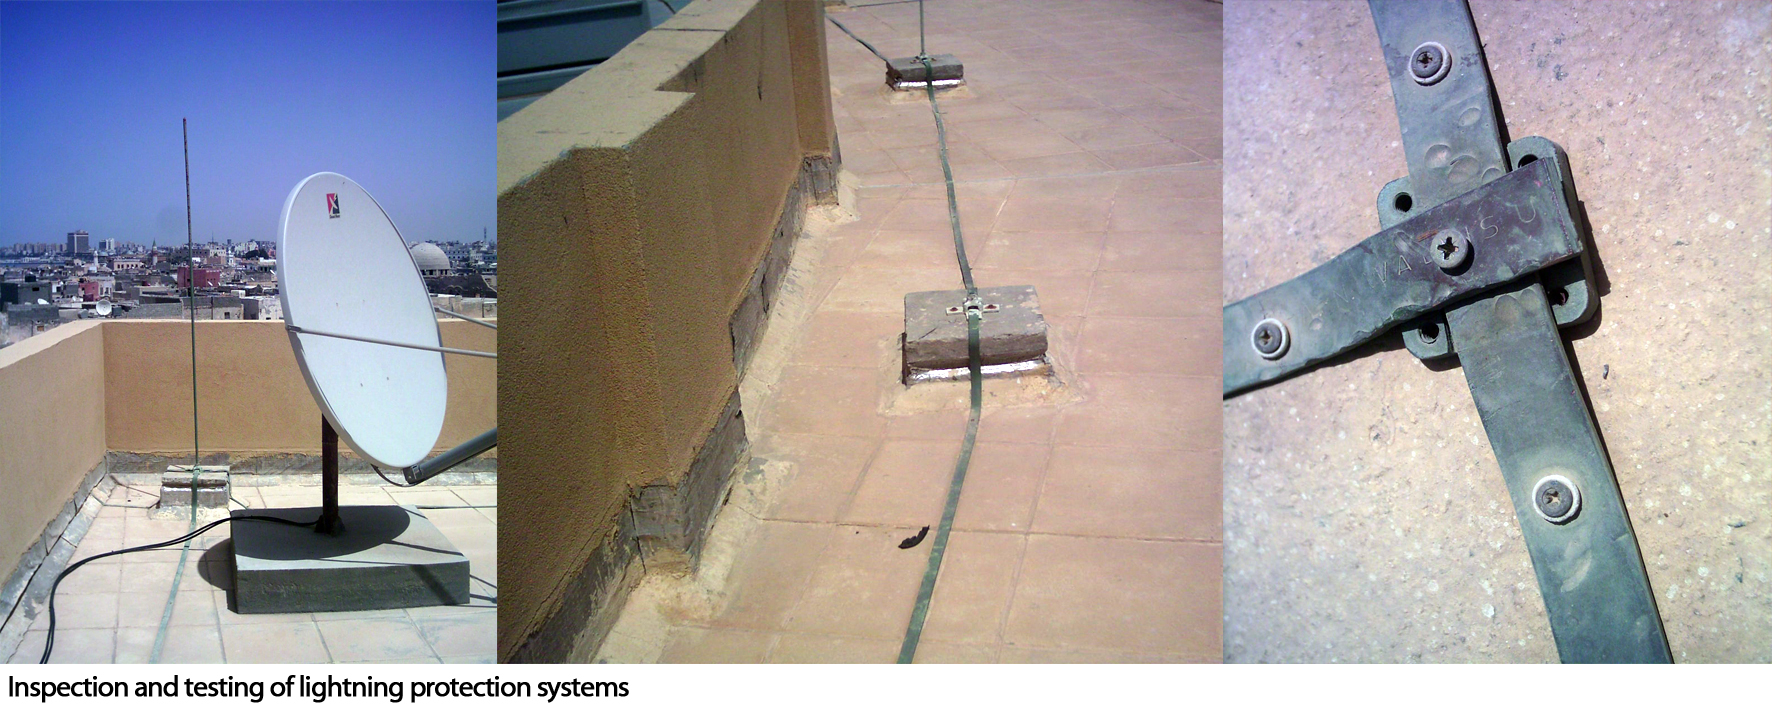 Lightning Protection Systems Galea Curmi